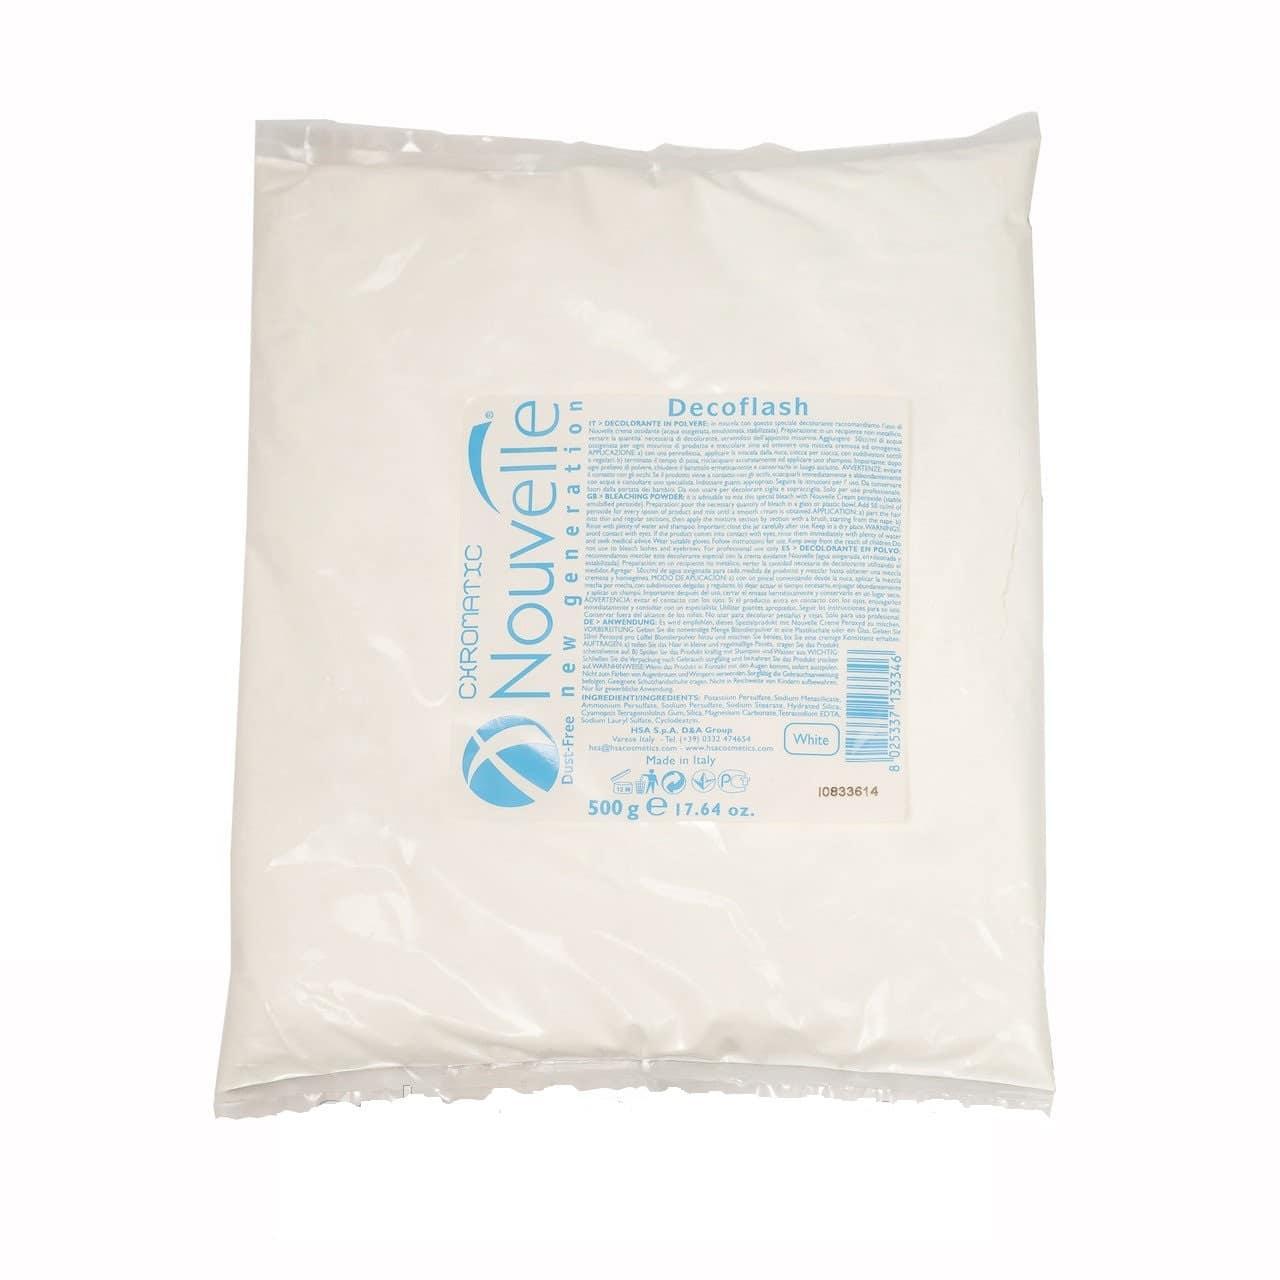 Освітлювач Nouvelle Decoflash Refill White 500 г